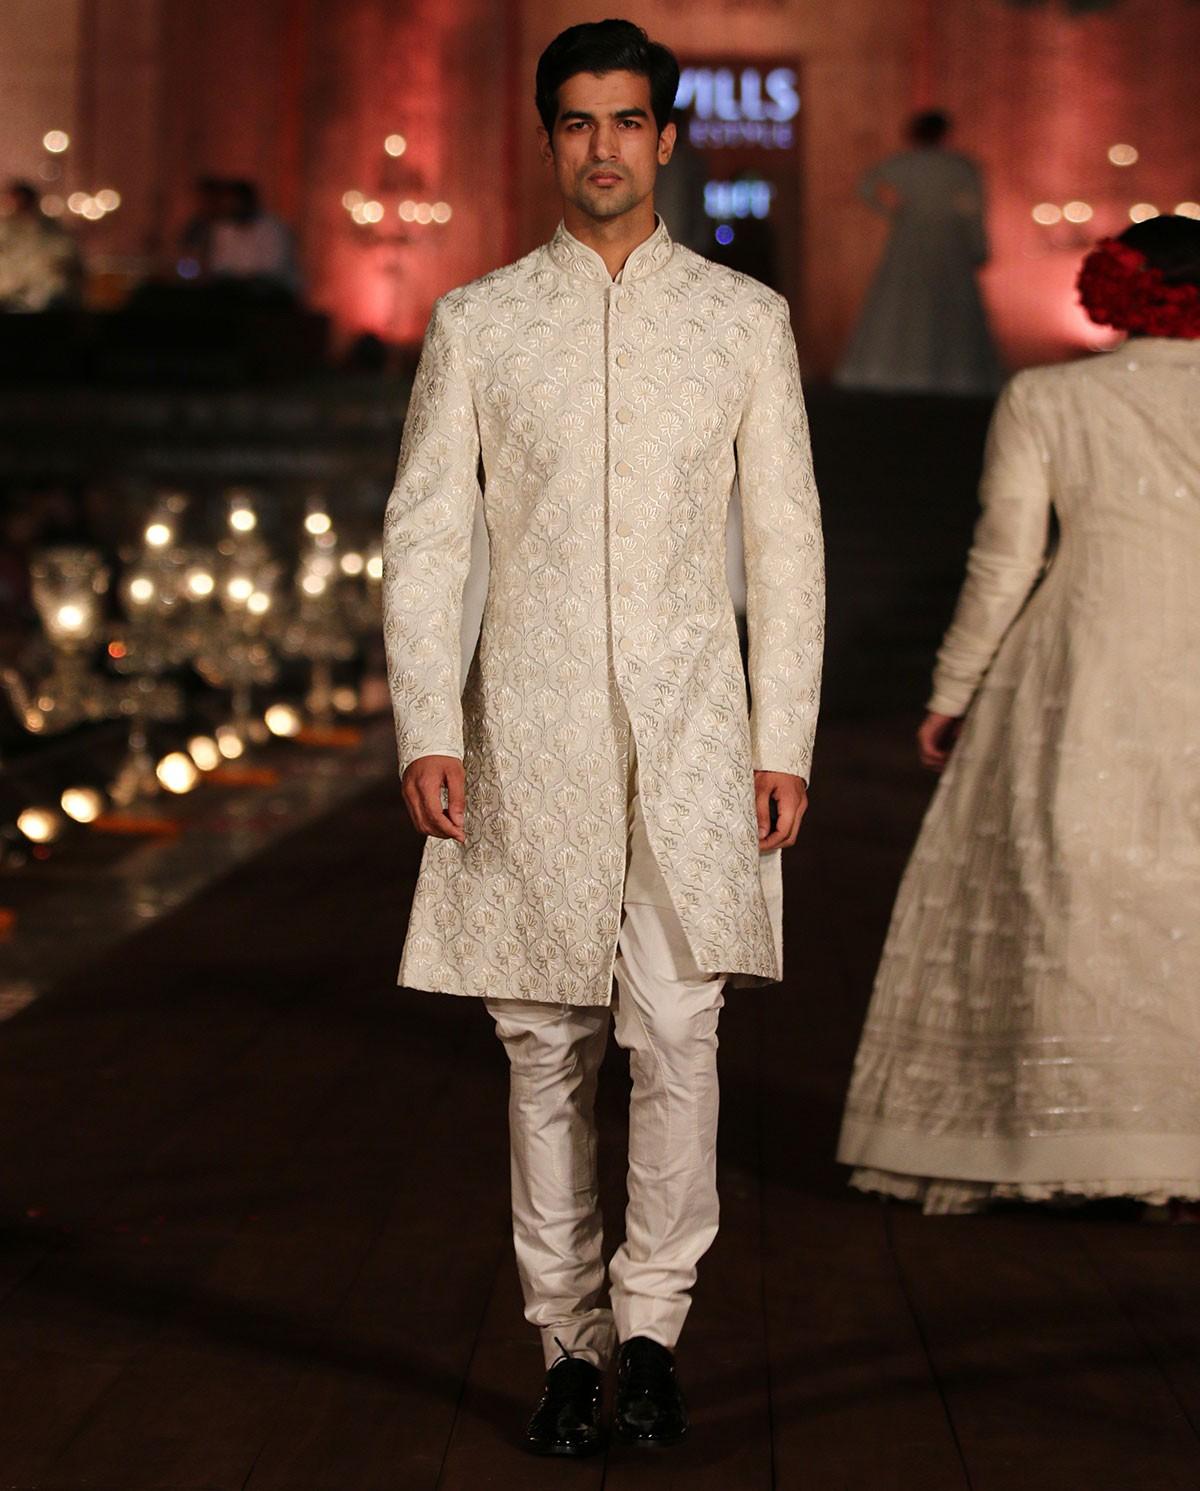 inidan-designer-sherwanis-rohit-bal-2